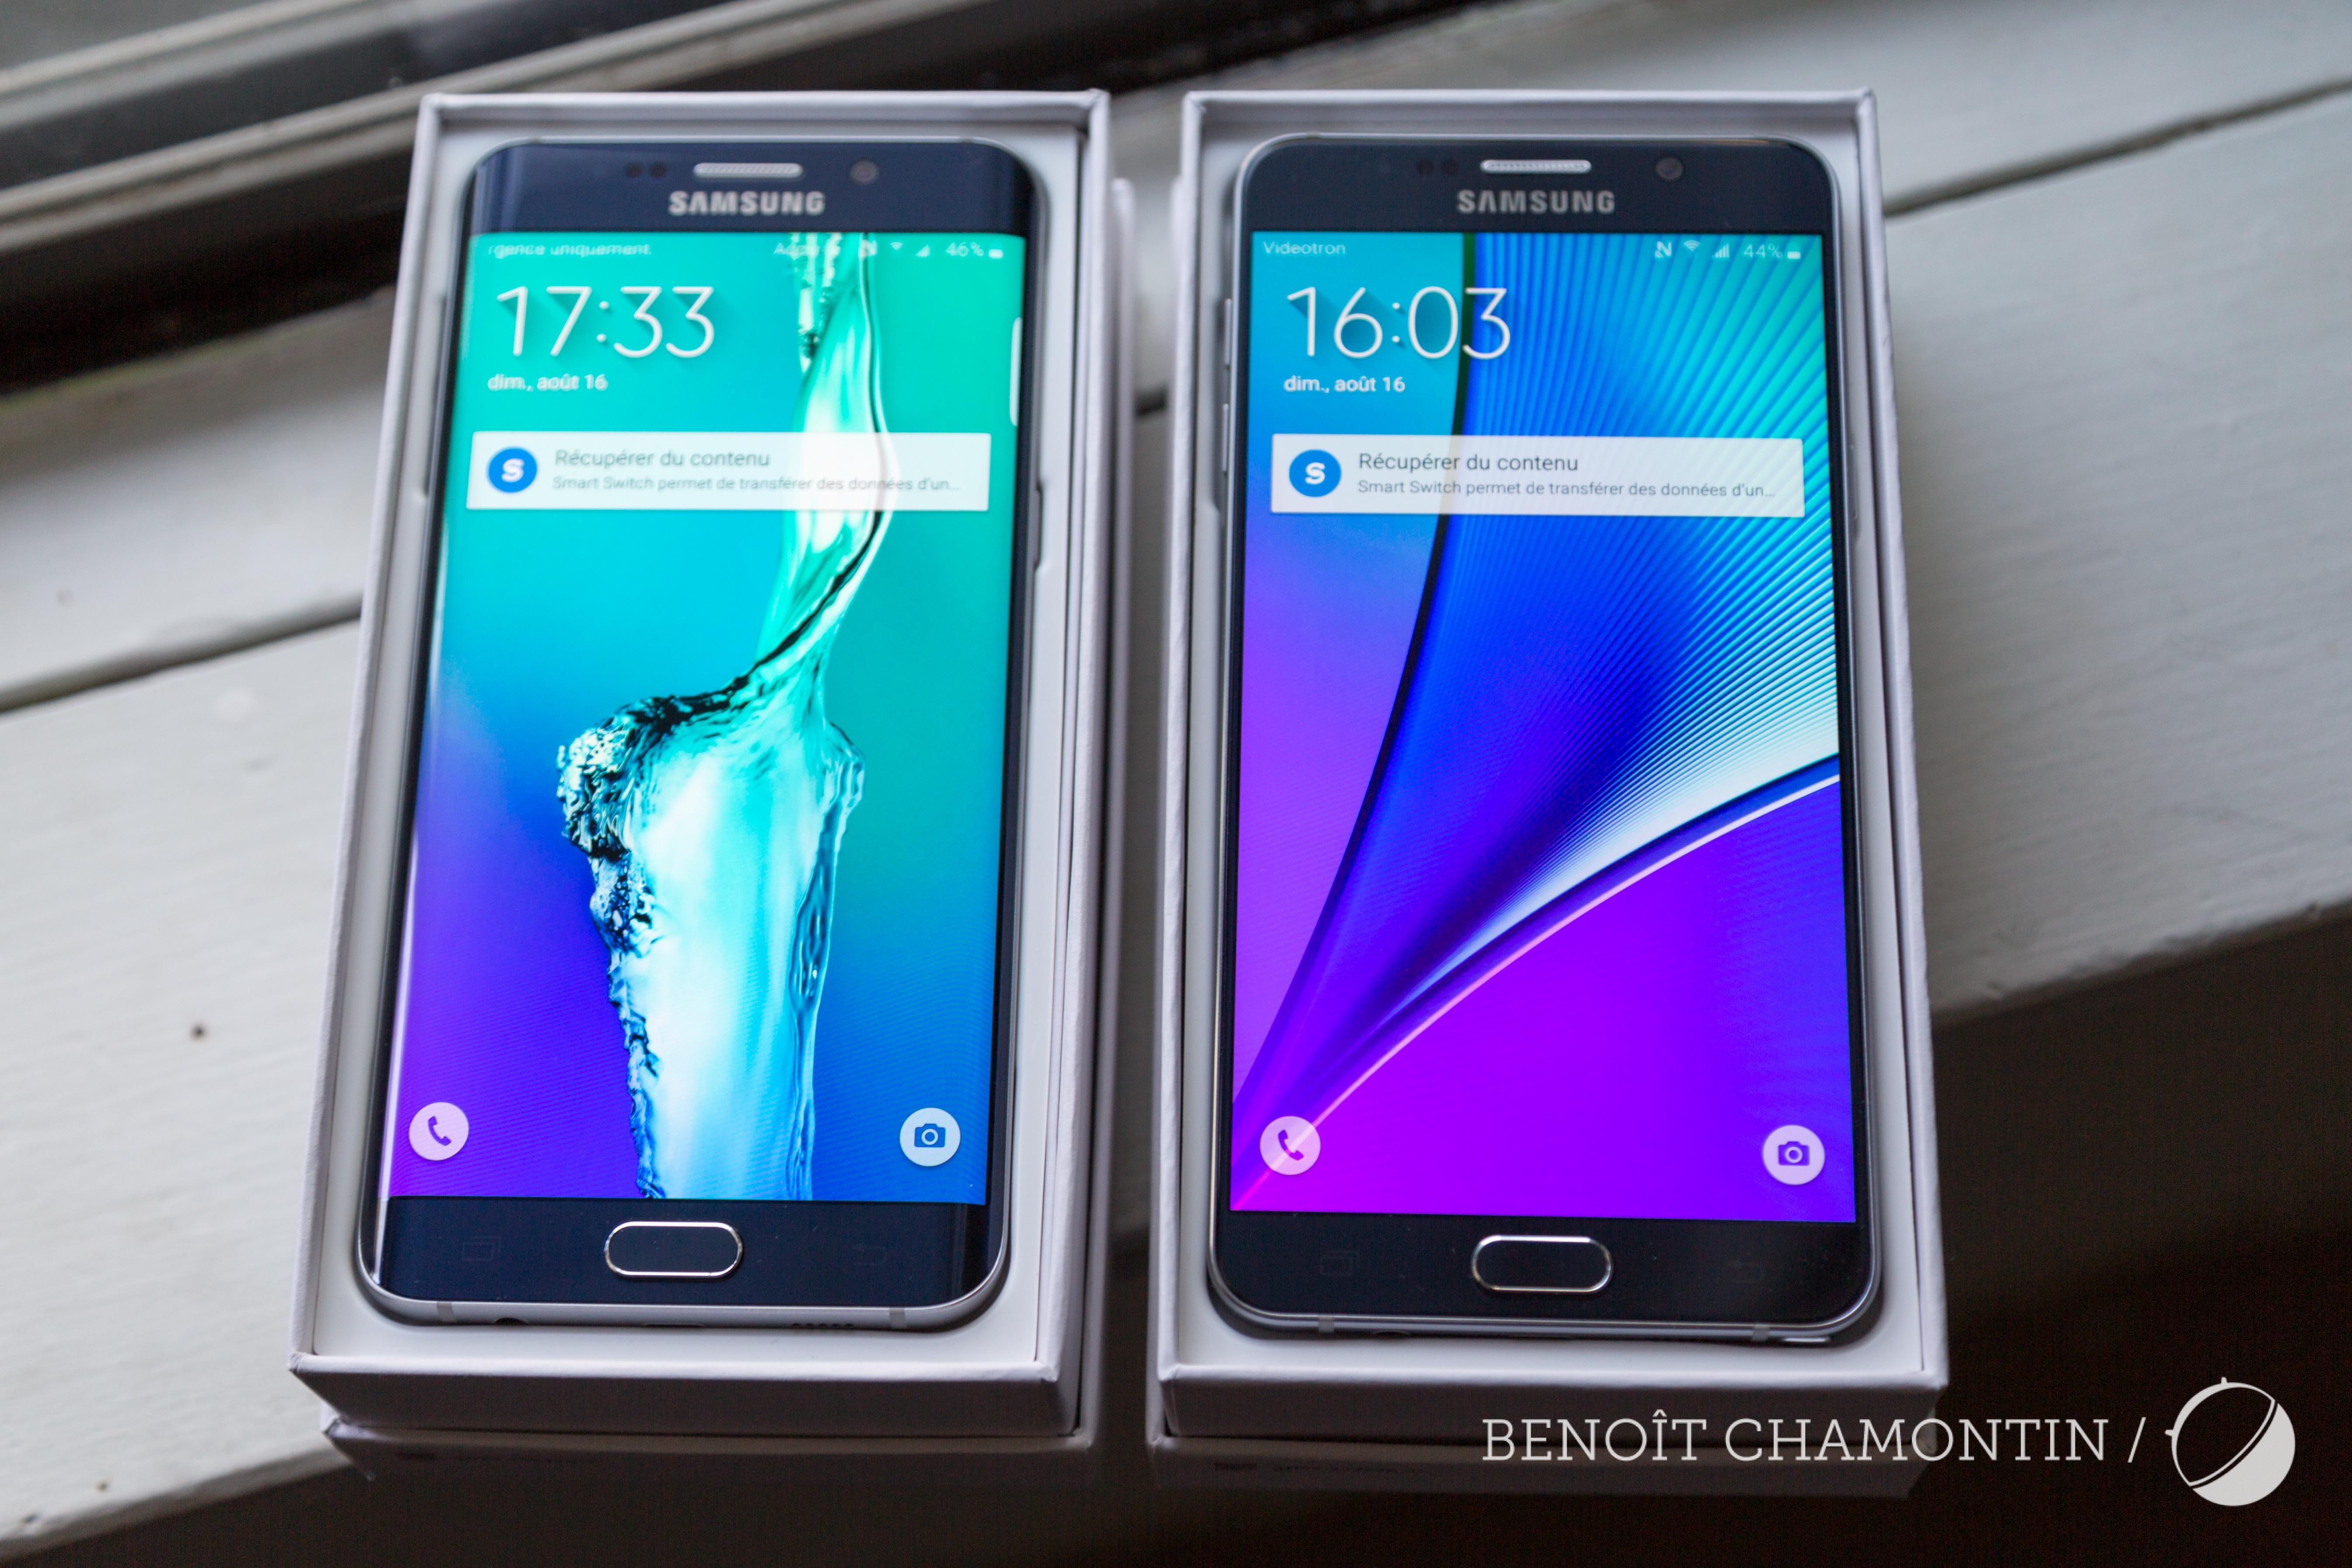 Prise En Main Du Samsung Galaxy Note 5 Labsent Regrett Frandroid Smartphone Geeks And Com 1